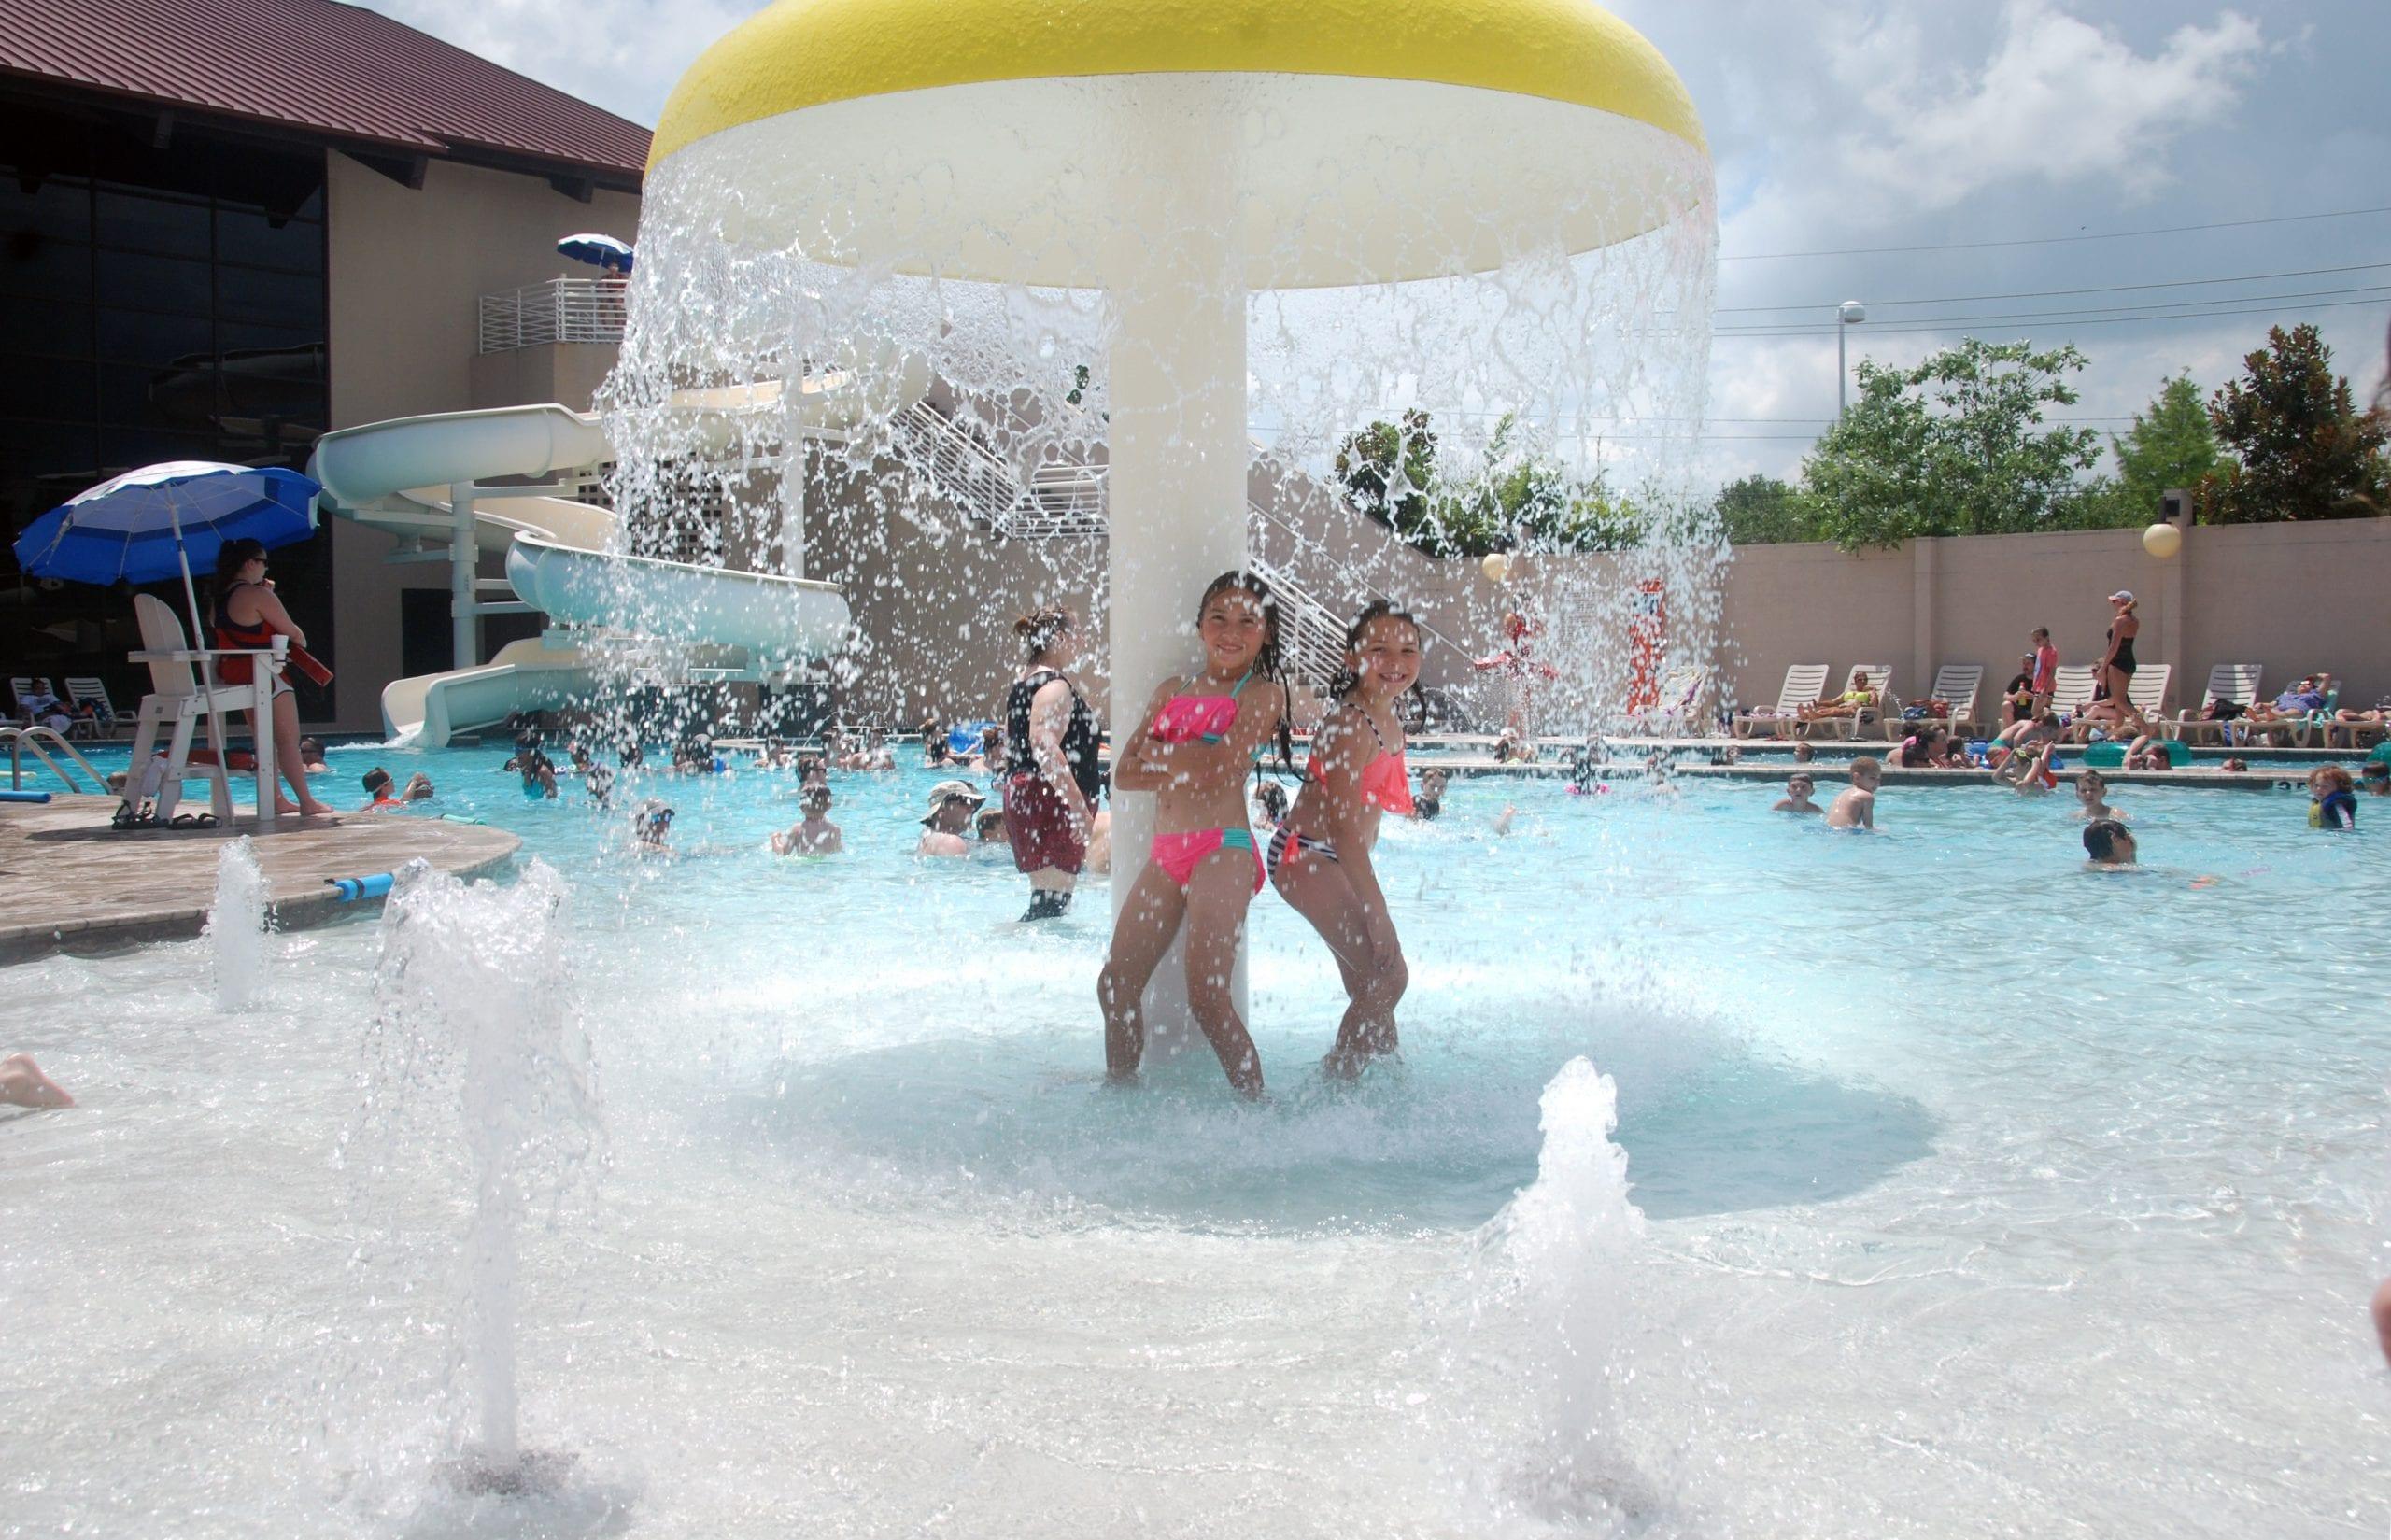 Jaelyn and Kamryn Benham under mushroom in kids pool at Red's in Lafayette, La